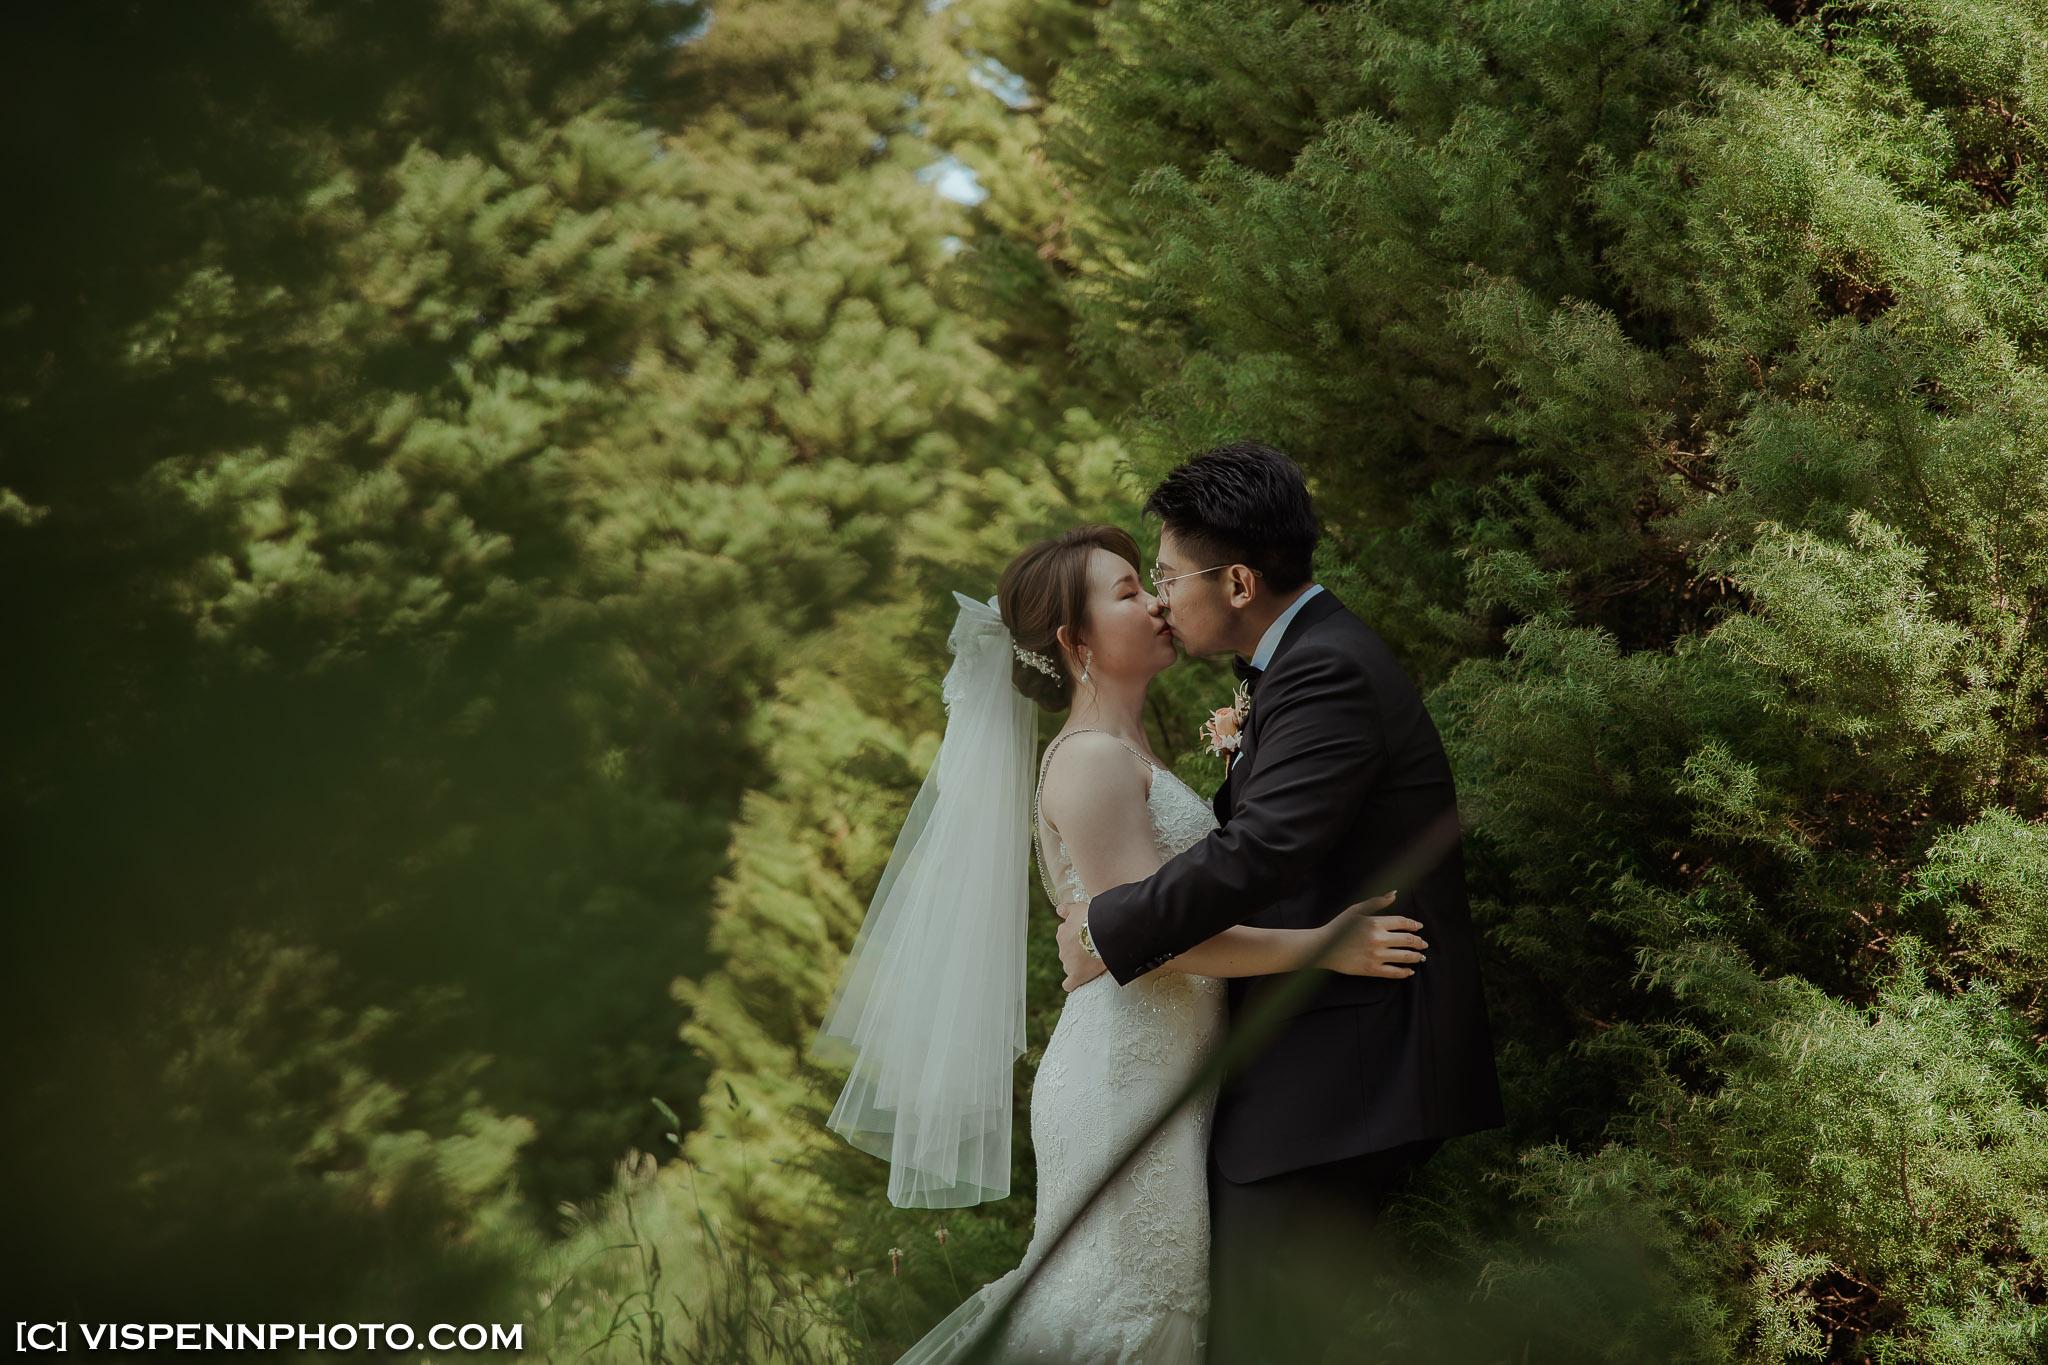 WEDDING DAY Photography Melbourne ElitaPB 06385 1P EOSR ZHPENN